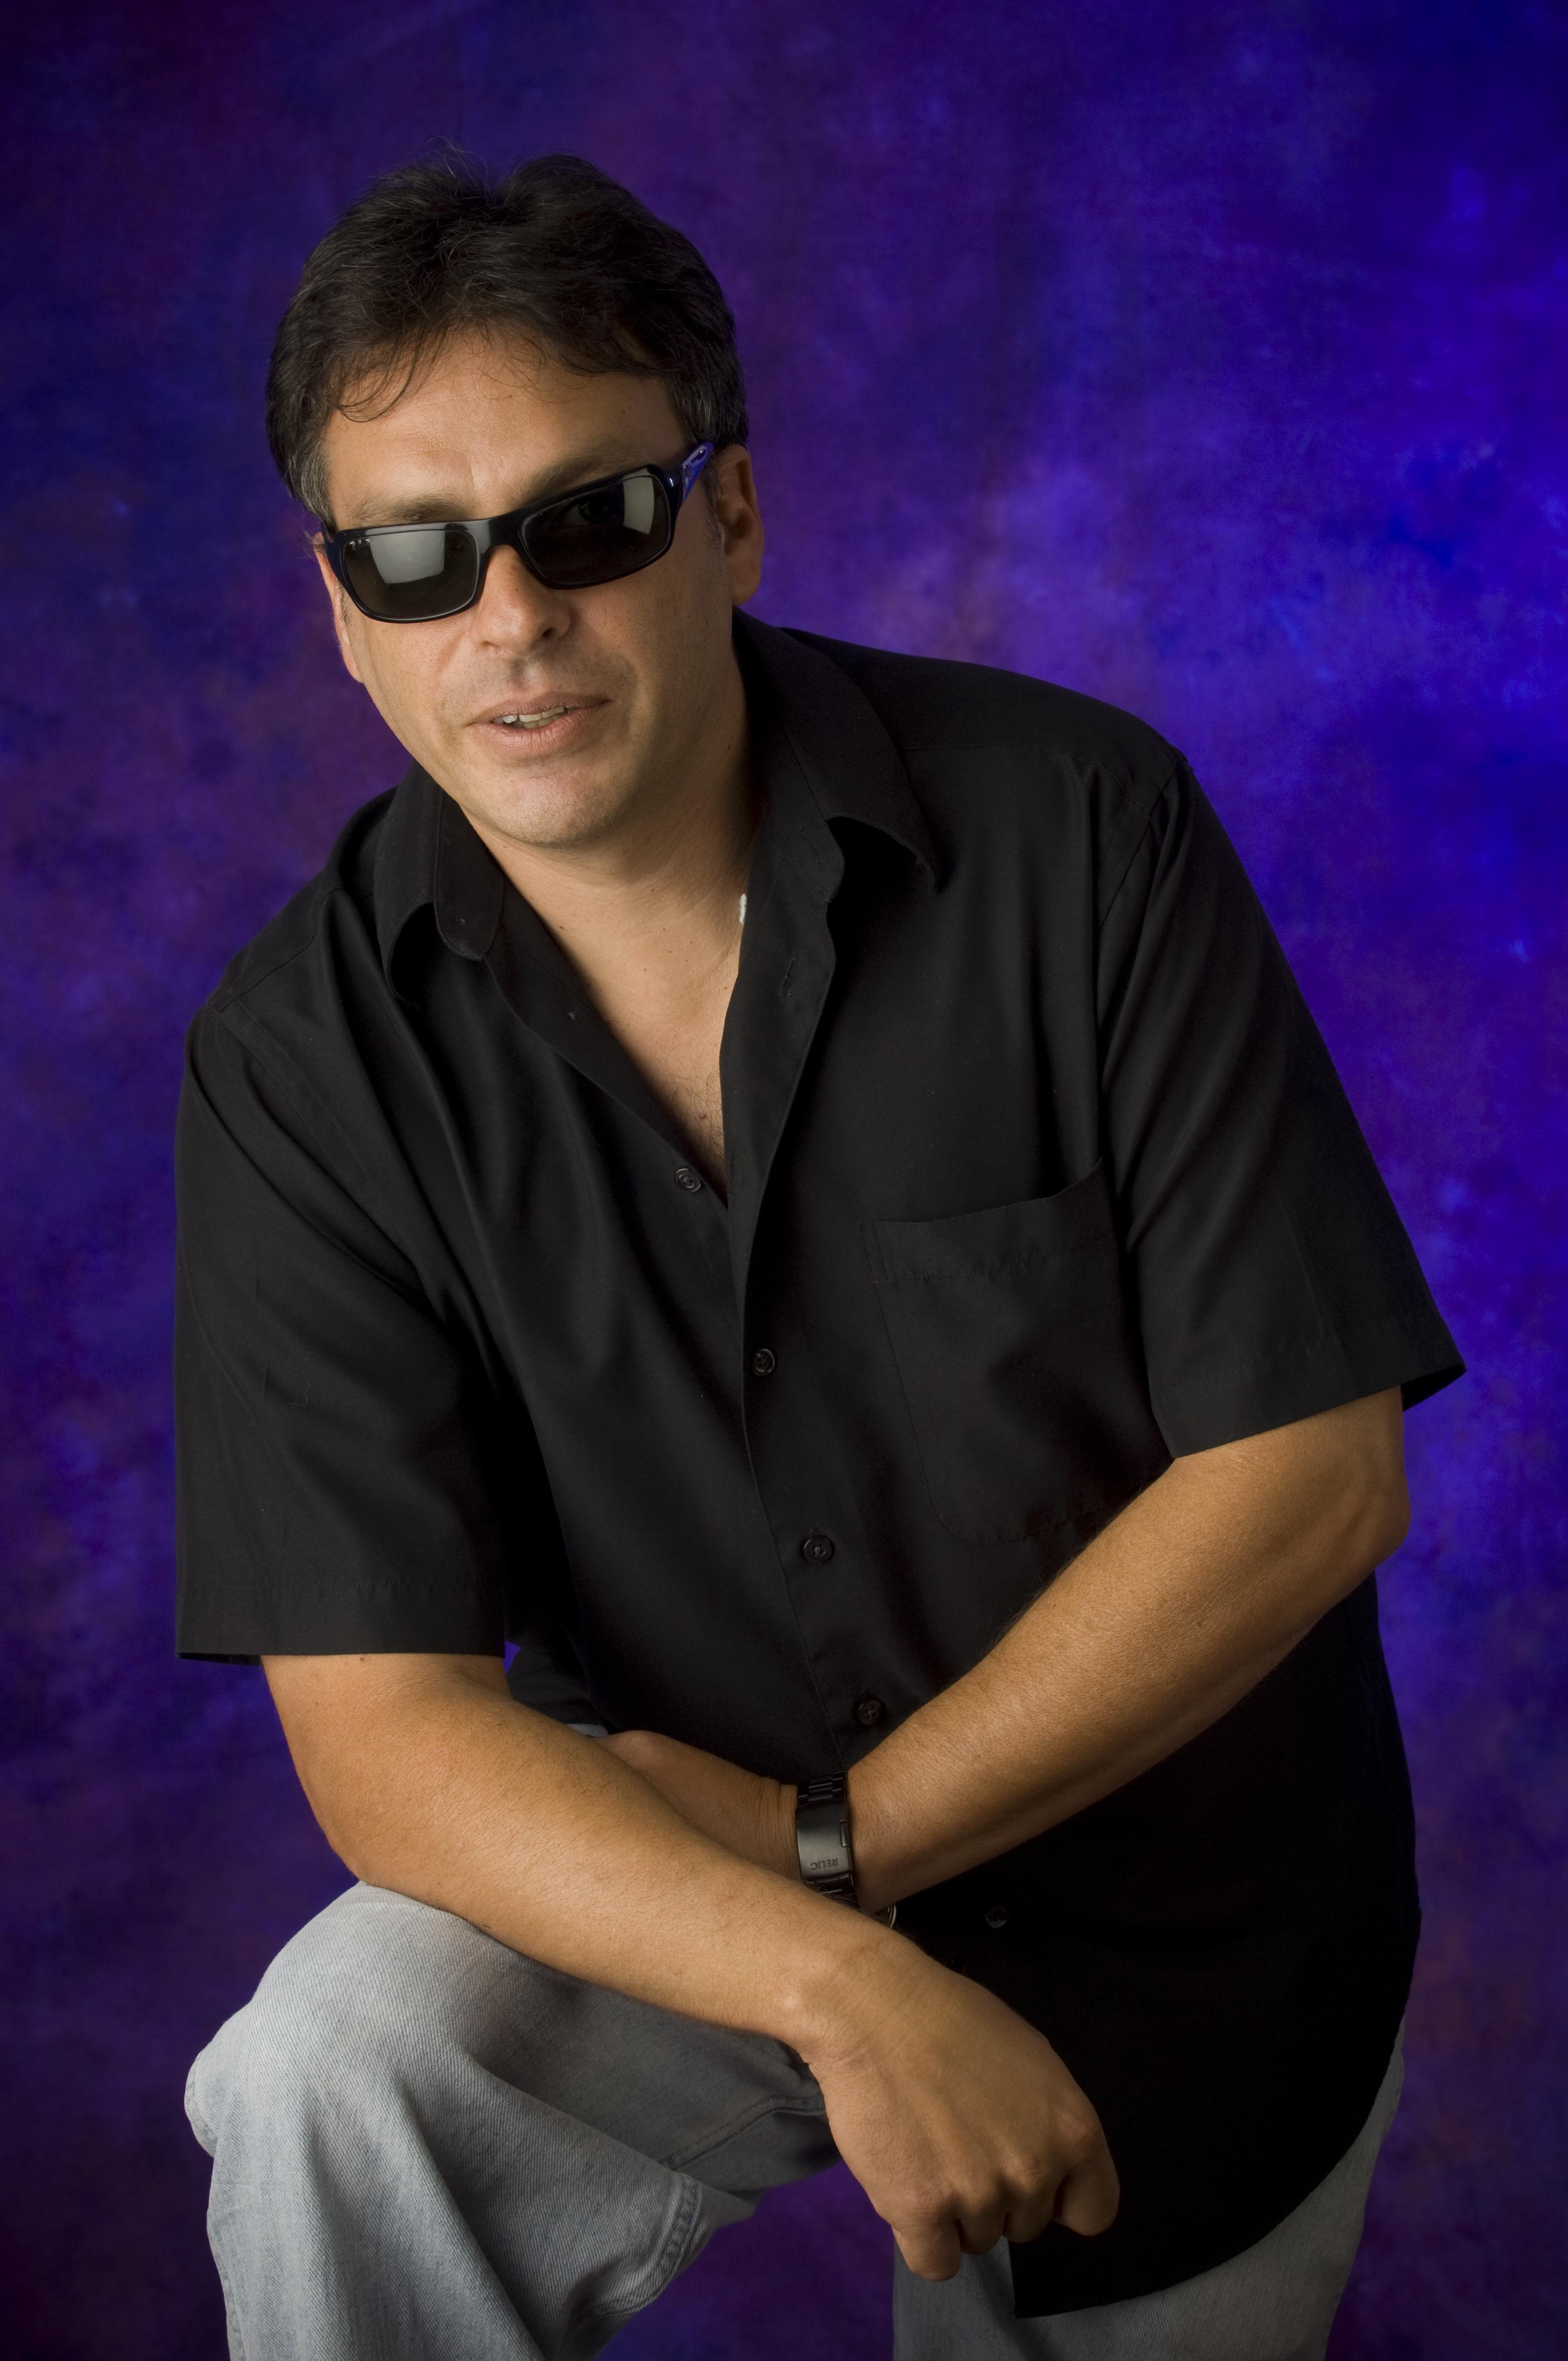 Pete Scordato